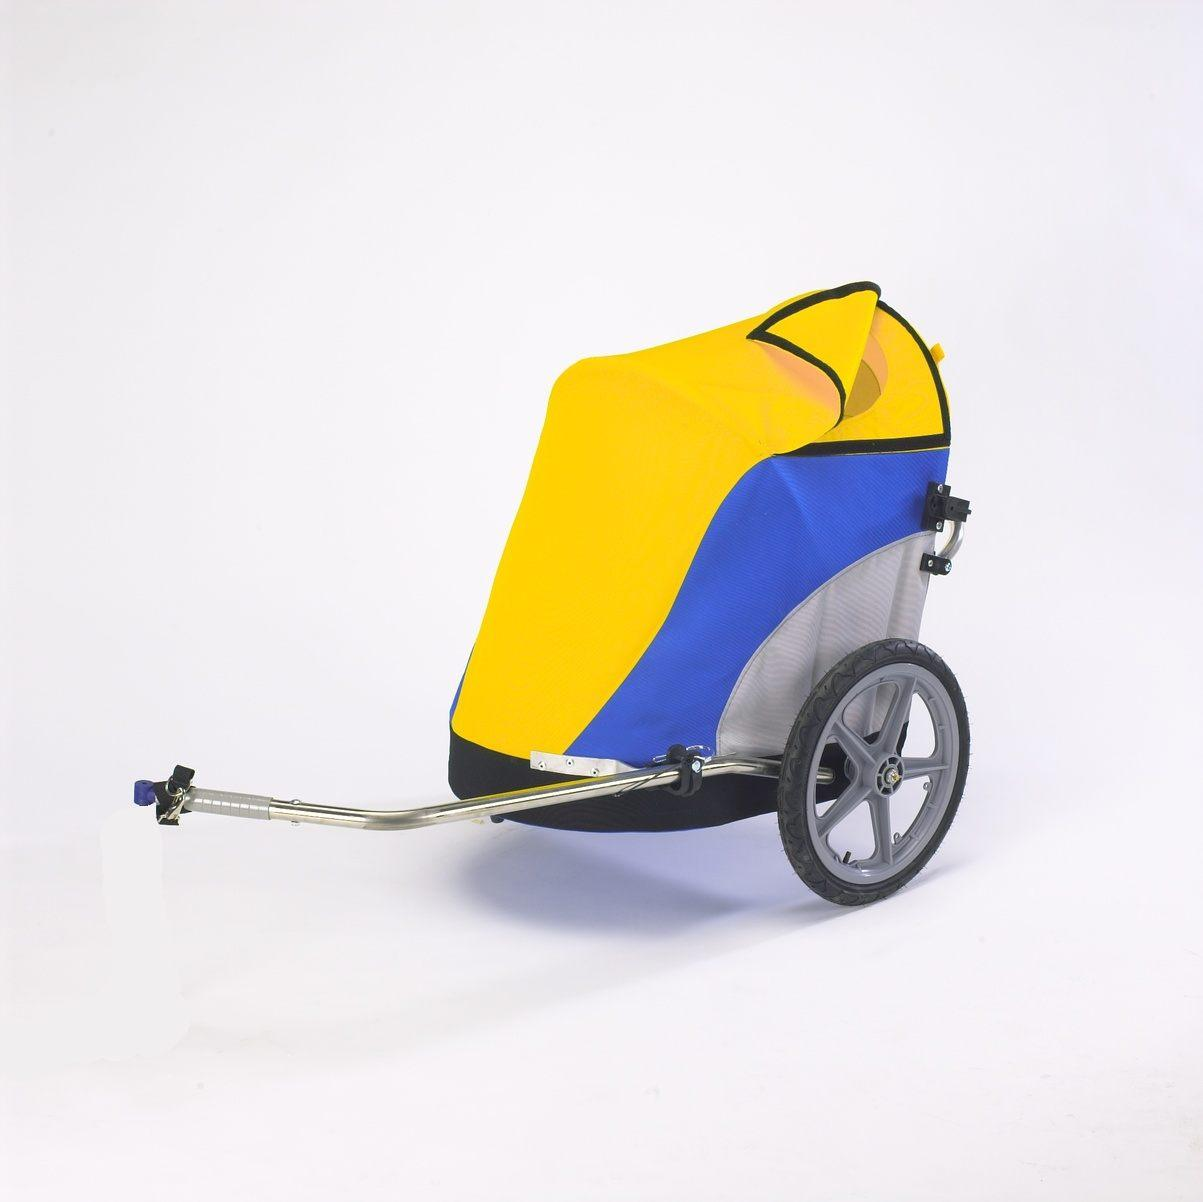 Wike City Cargo Shopper Bicycle Trailer Yellow